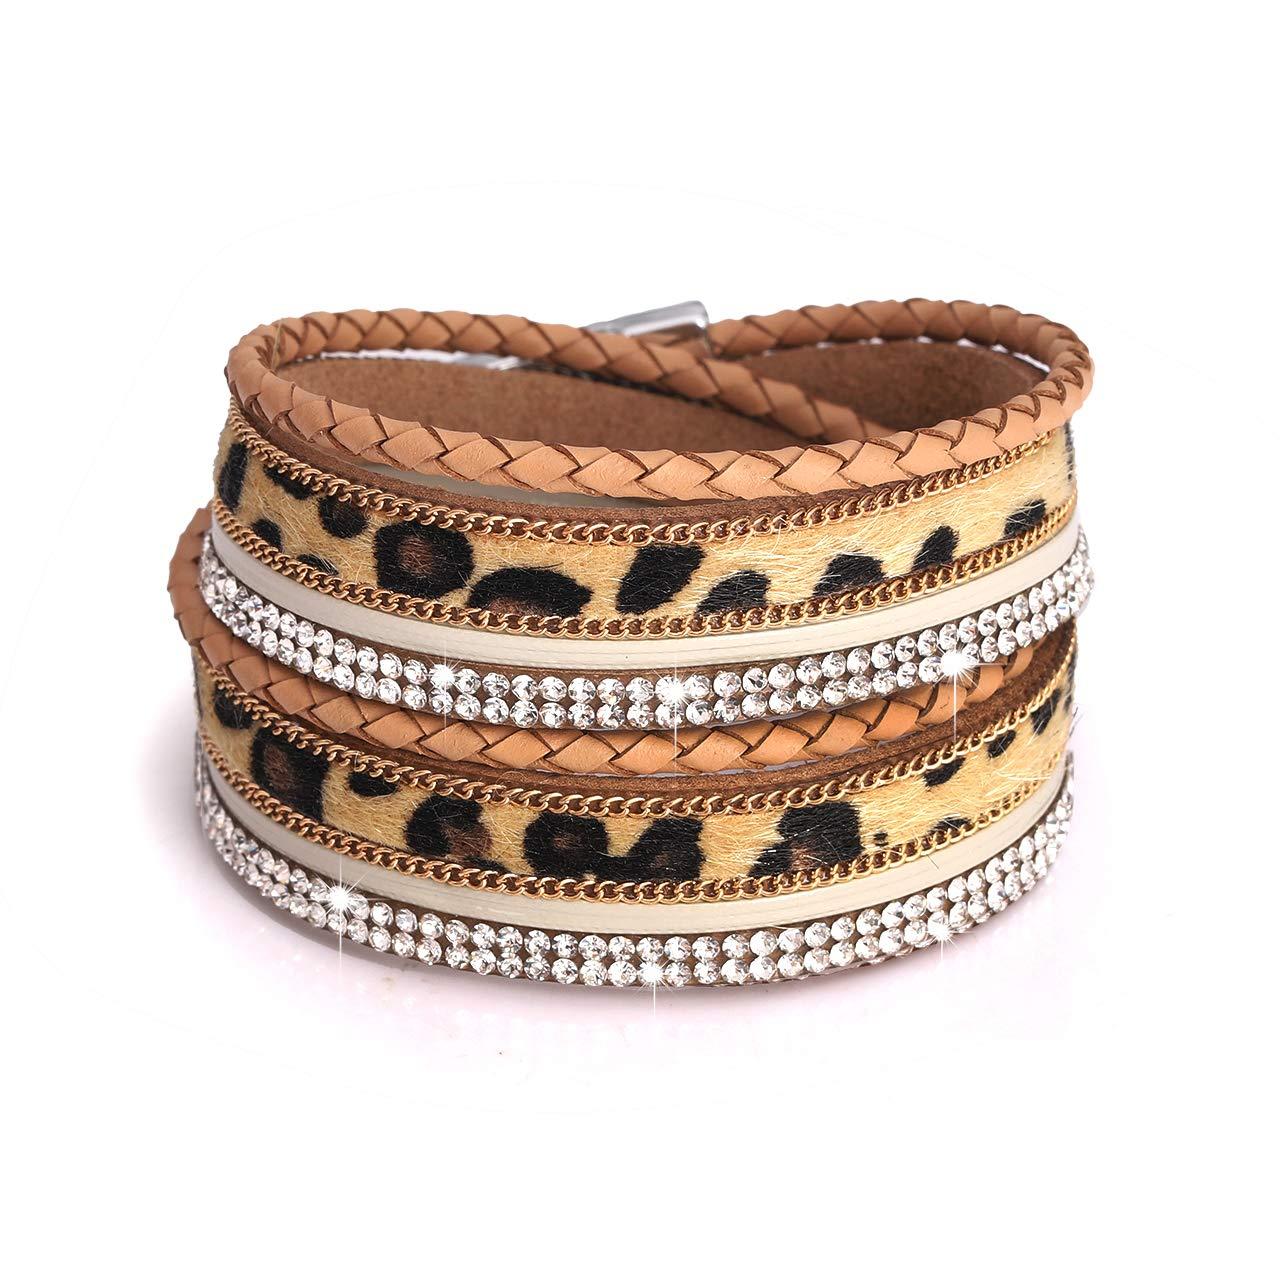 PHALIN Multi Strand Bracelets for Women Wide Leopard Horsehair Cuff Bangle Bracelets for Girls (A Light Brown) by PHALIN